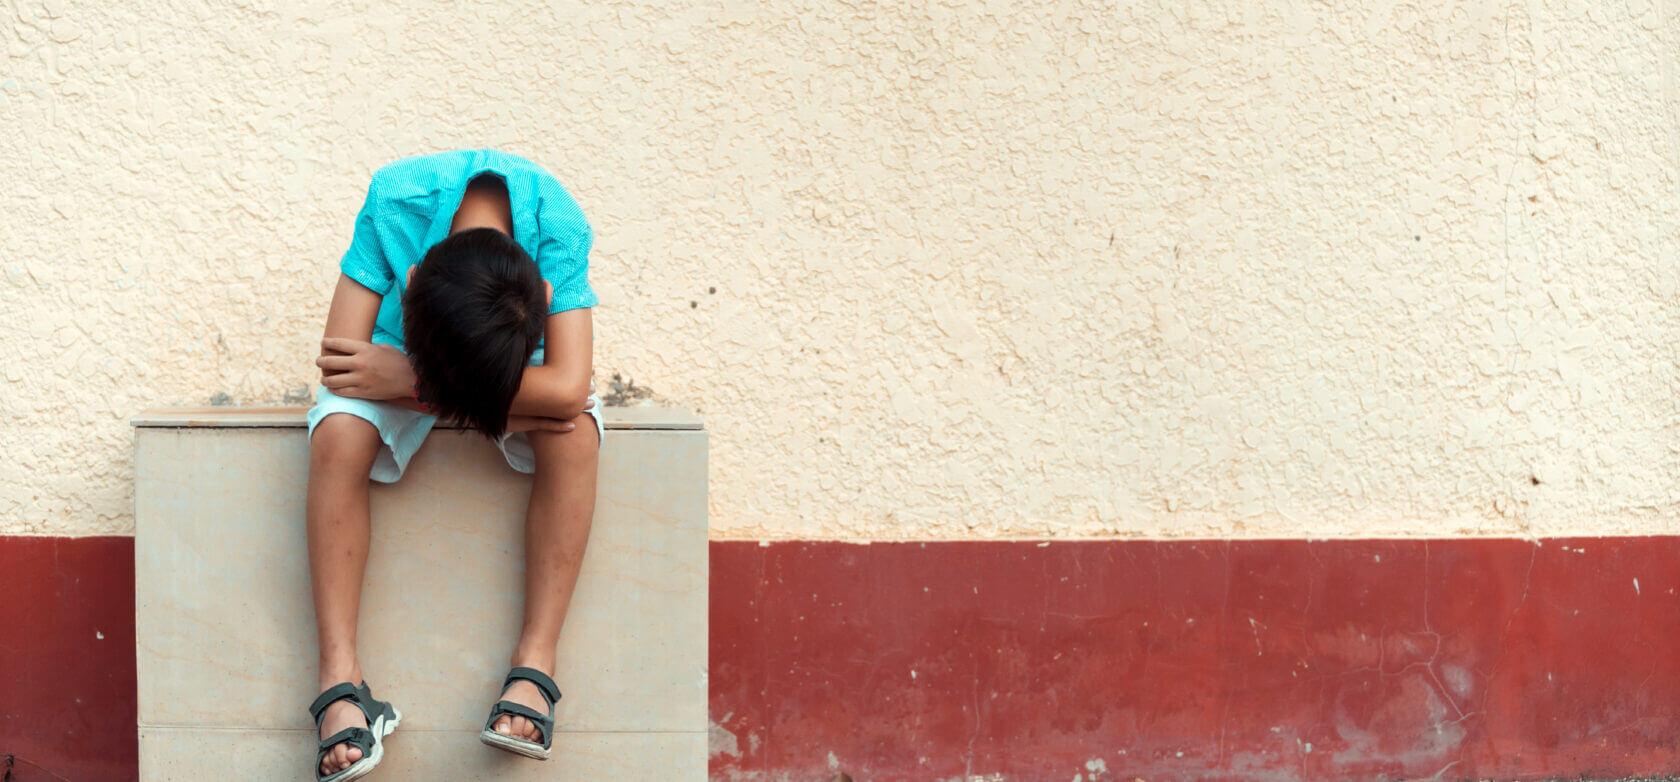 Moment-barn-ungdom-ADHD-utredning-behandling-KBT